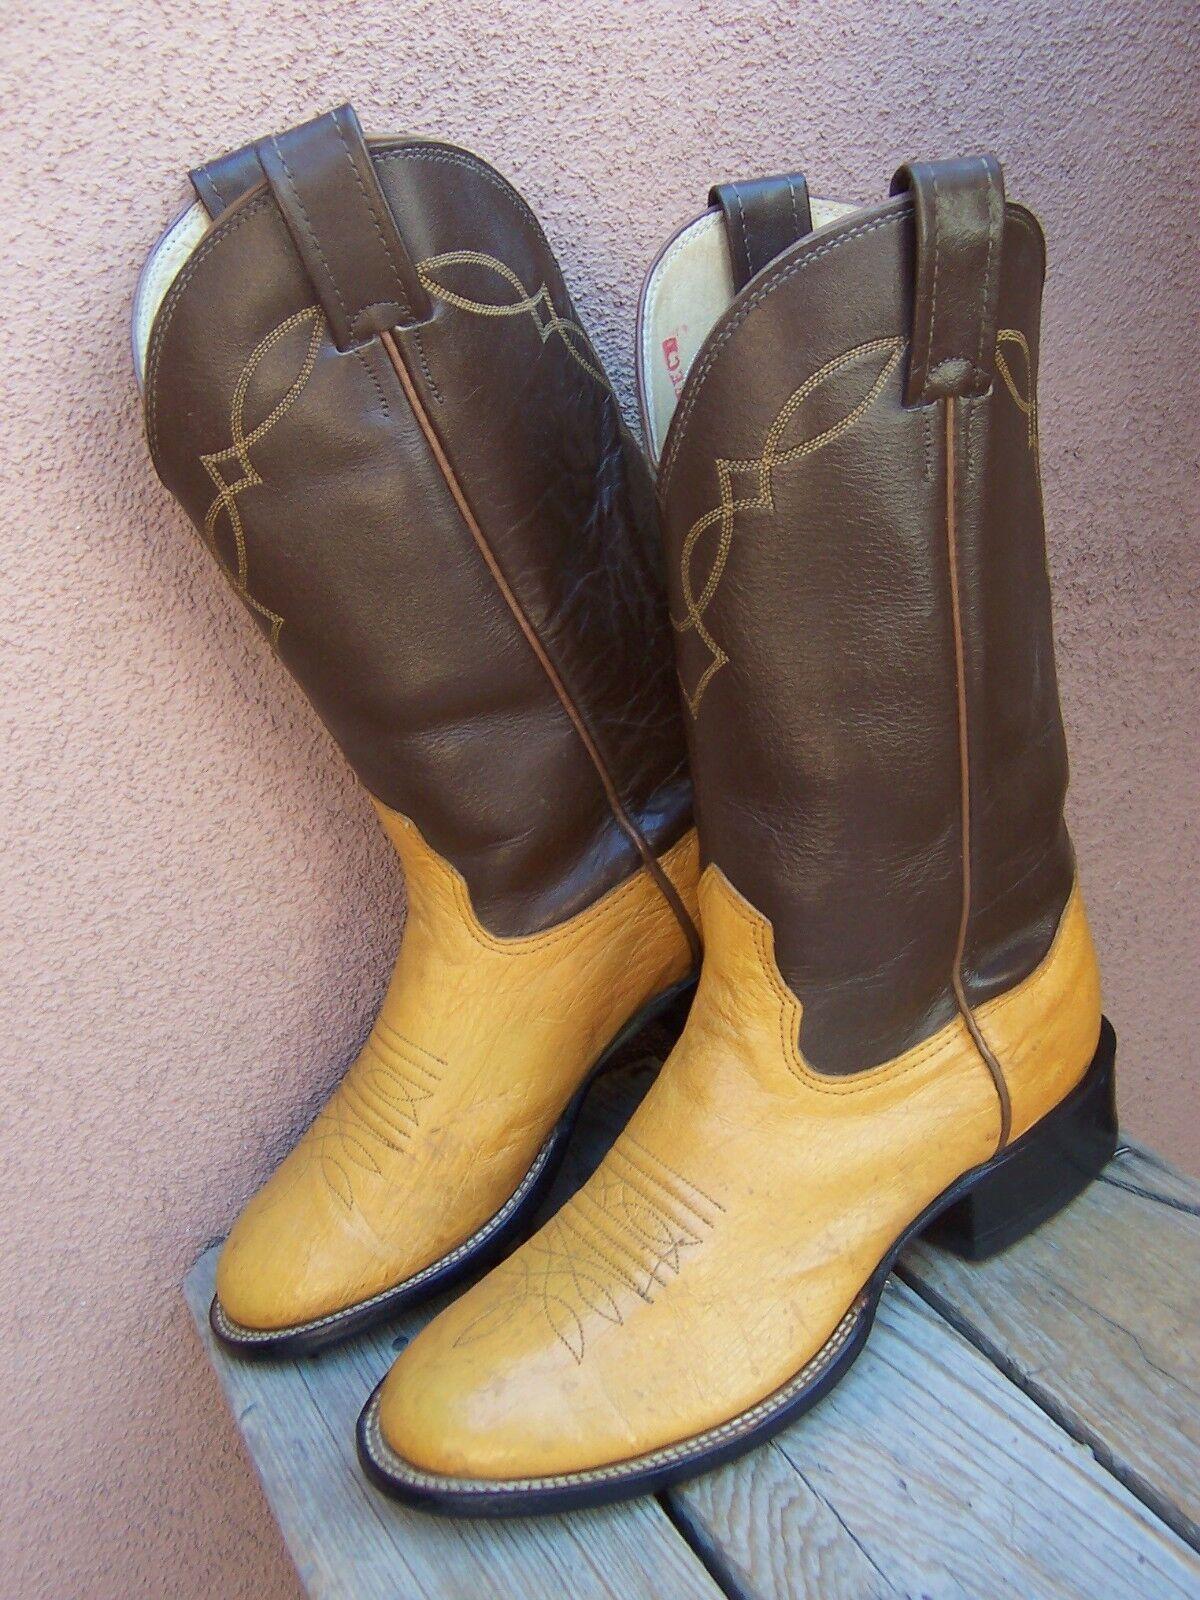 NOCONA Damenschuhe Cowboy Stiefel Soft Golden Palomino Leder Western Riding Größe 6D